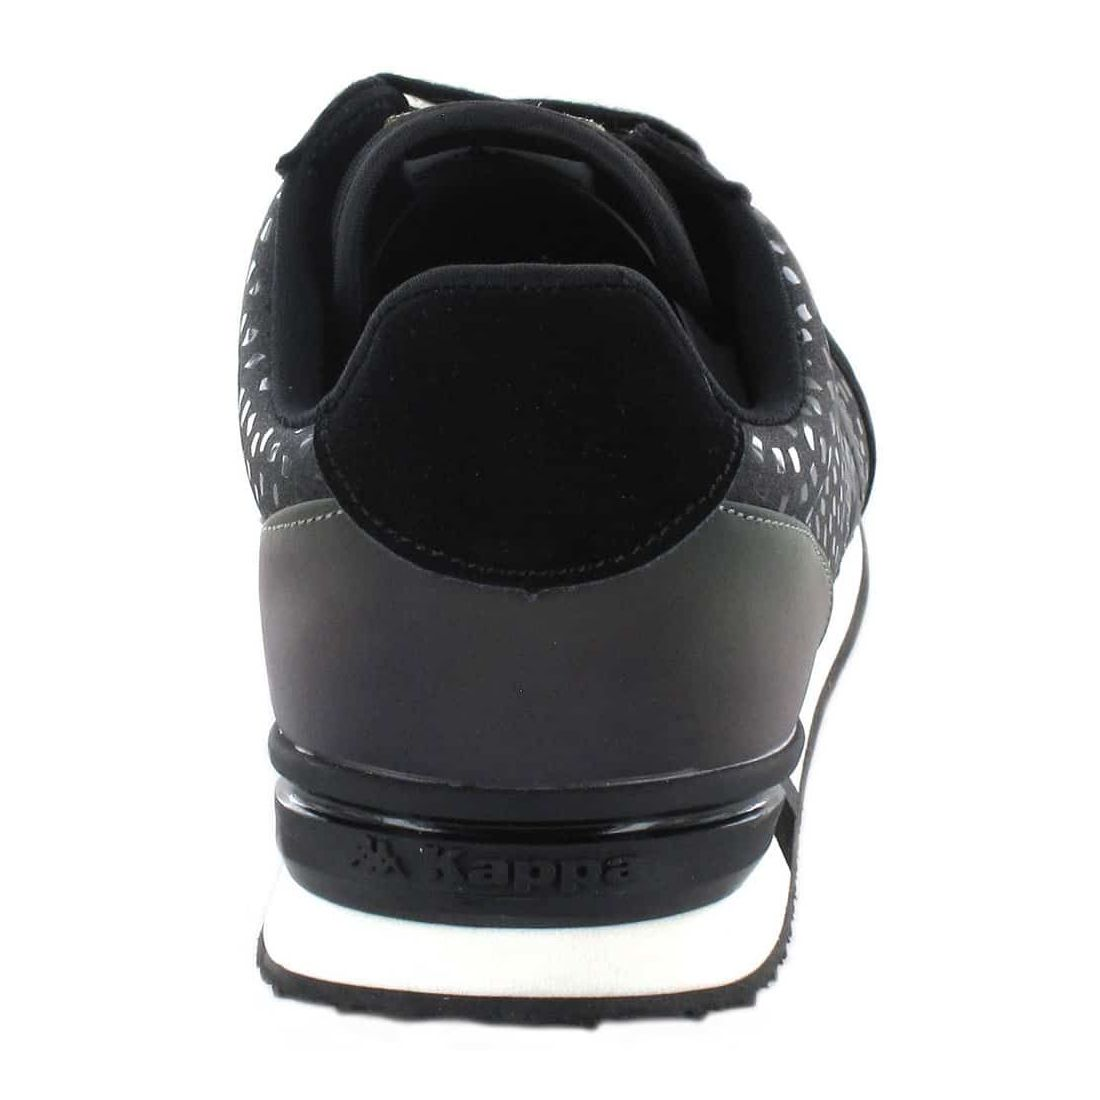 Kappa Mohan Black - Casual Shoe Woman